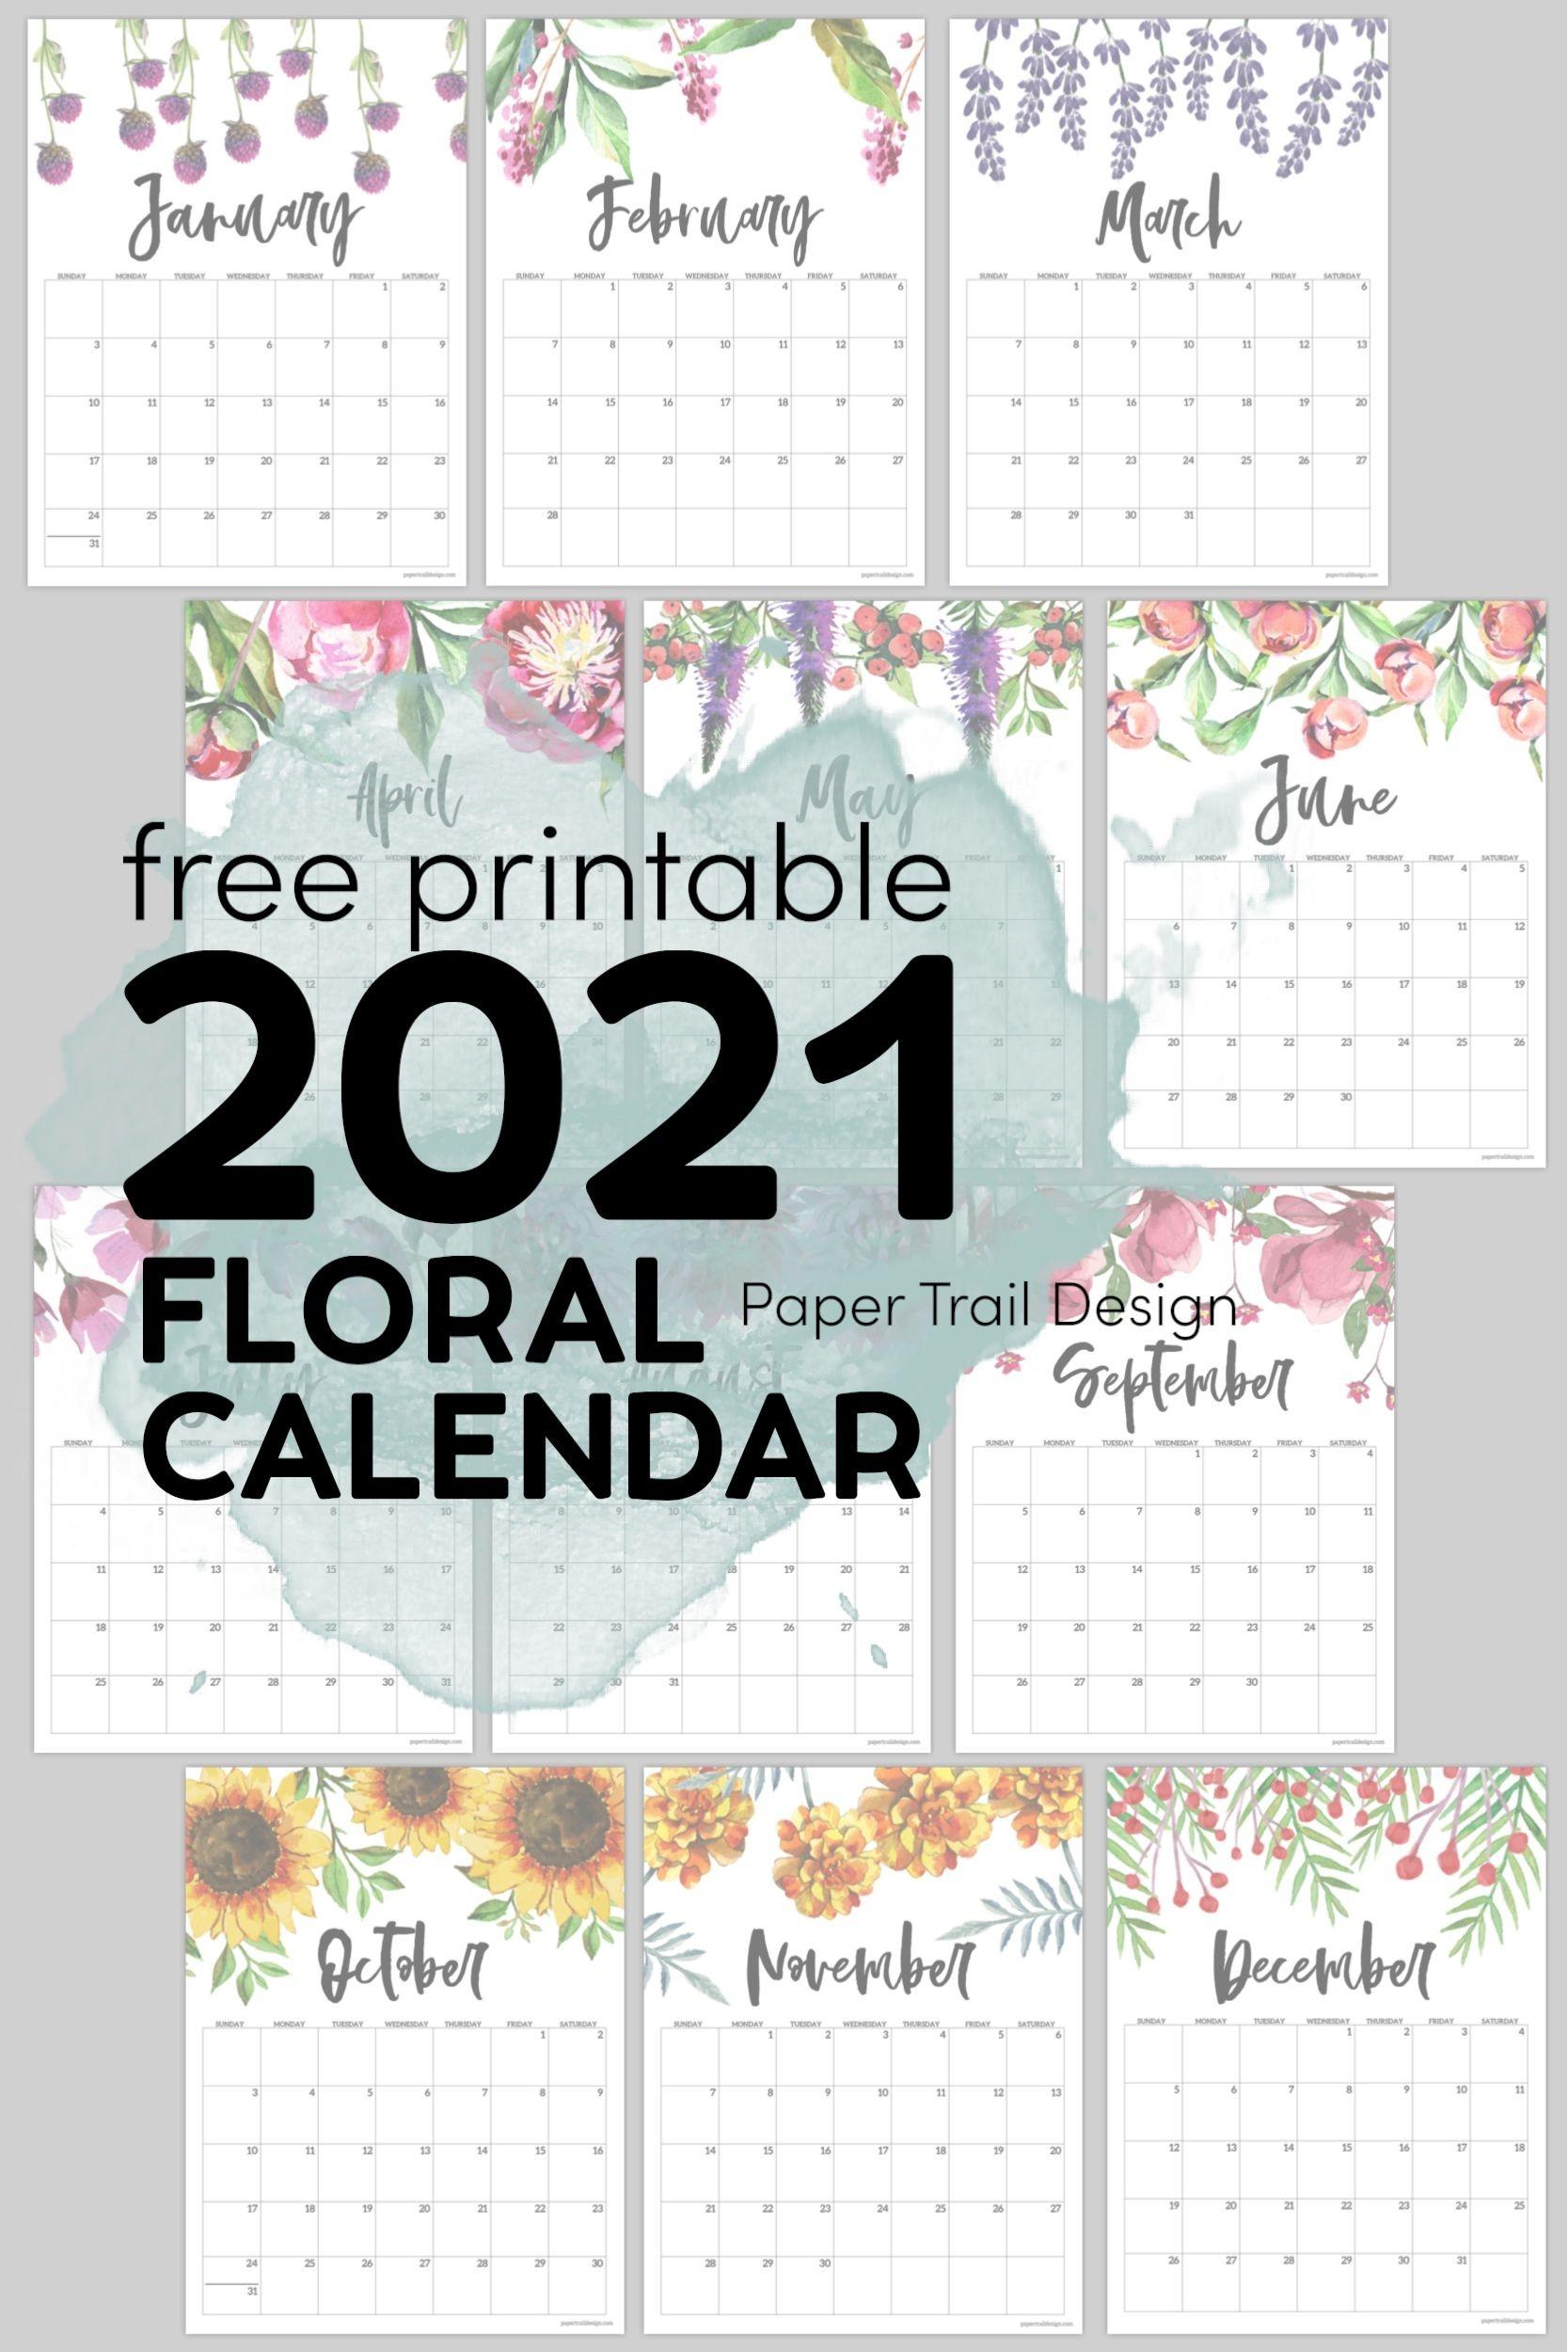 Pin On Calendars-4X6 Free Printables 2021 Calendars